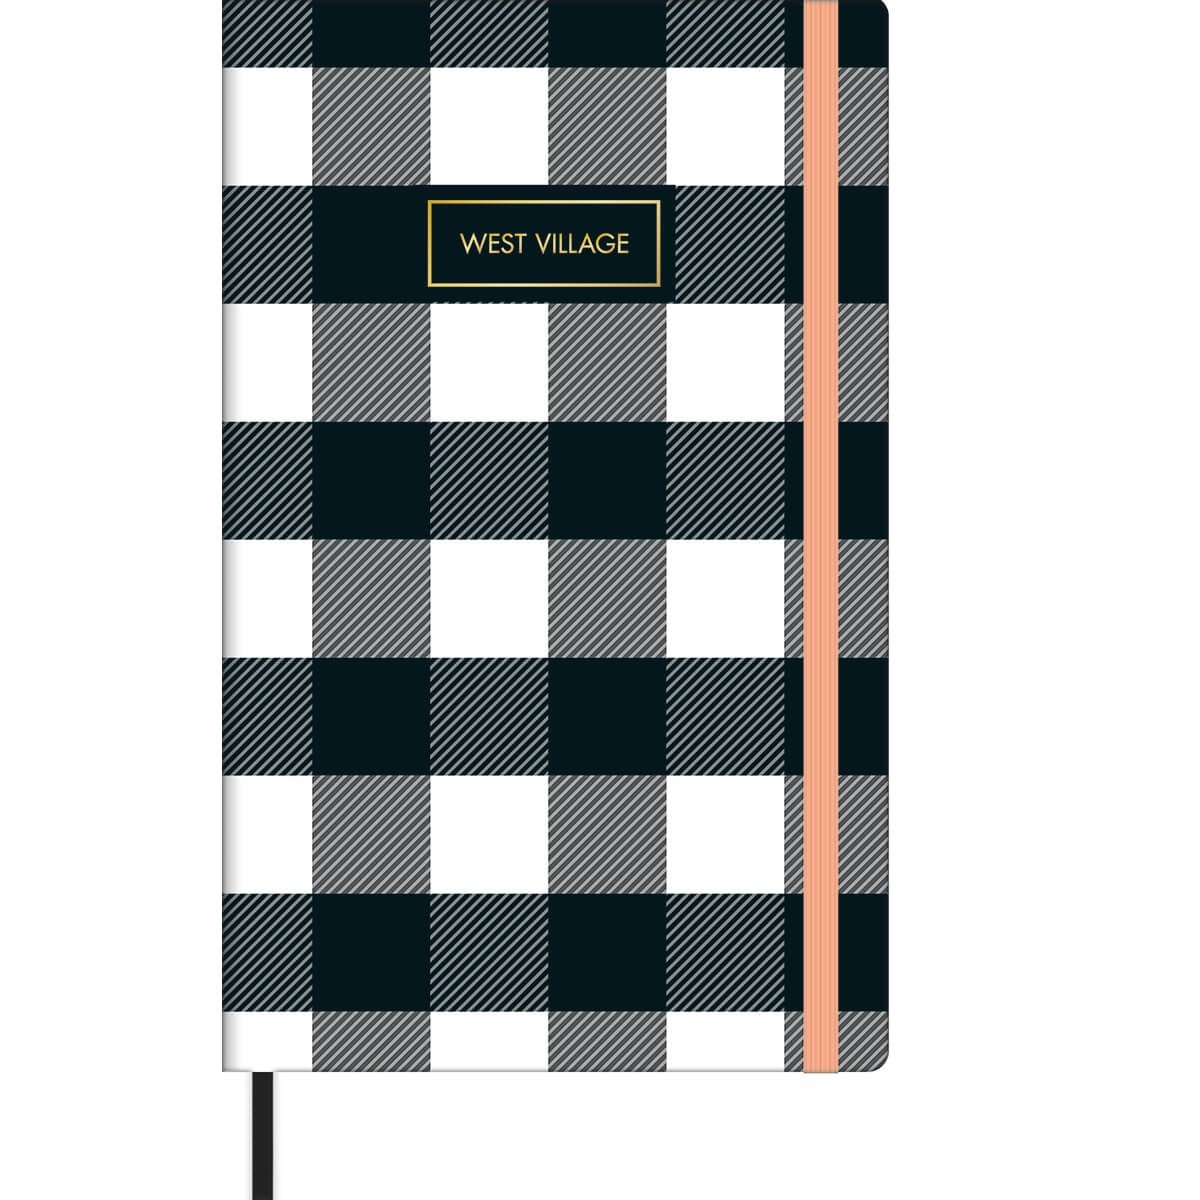 Caderno Sem Pauta Costurado Tilibra - West Village